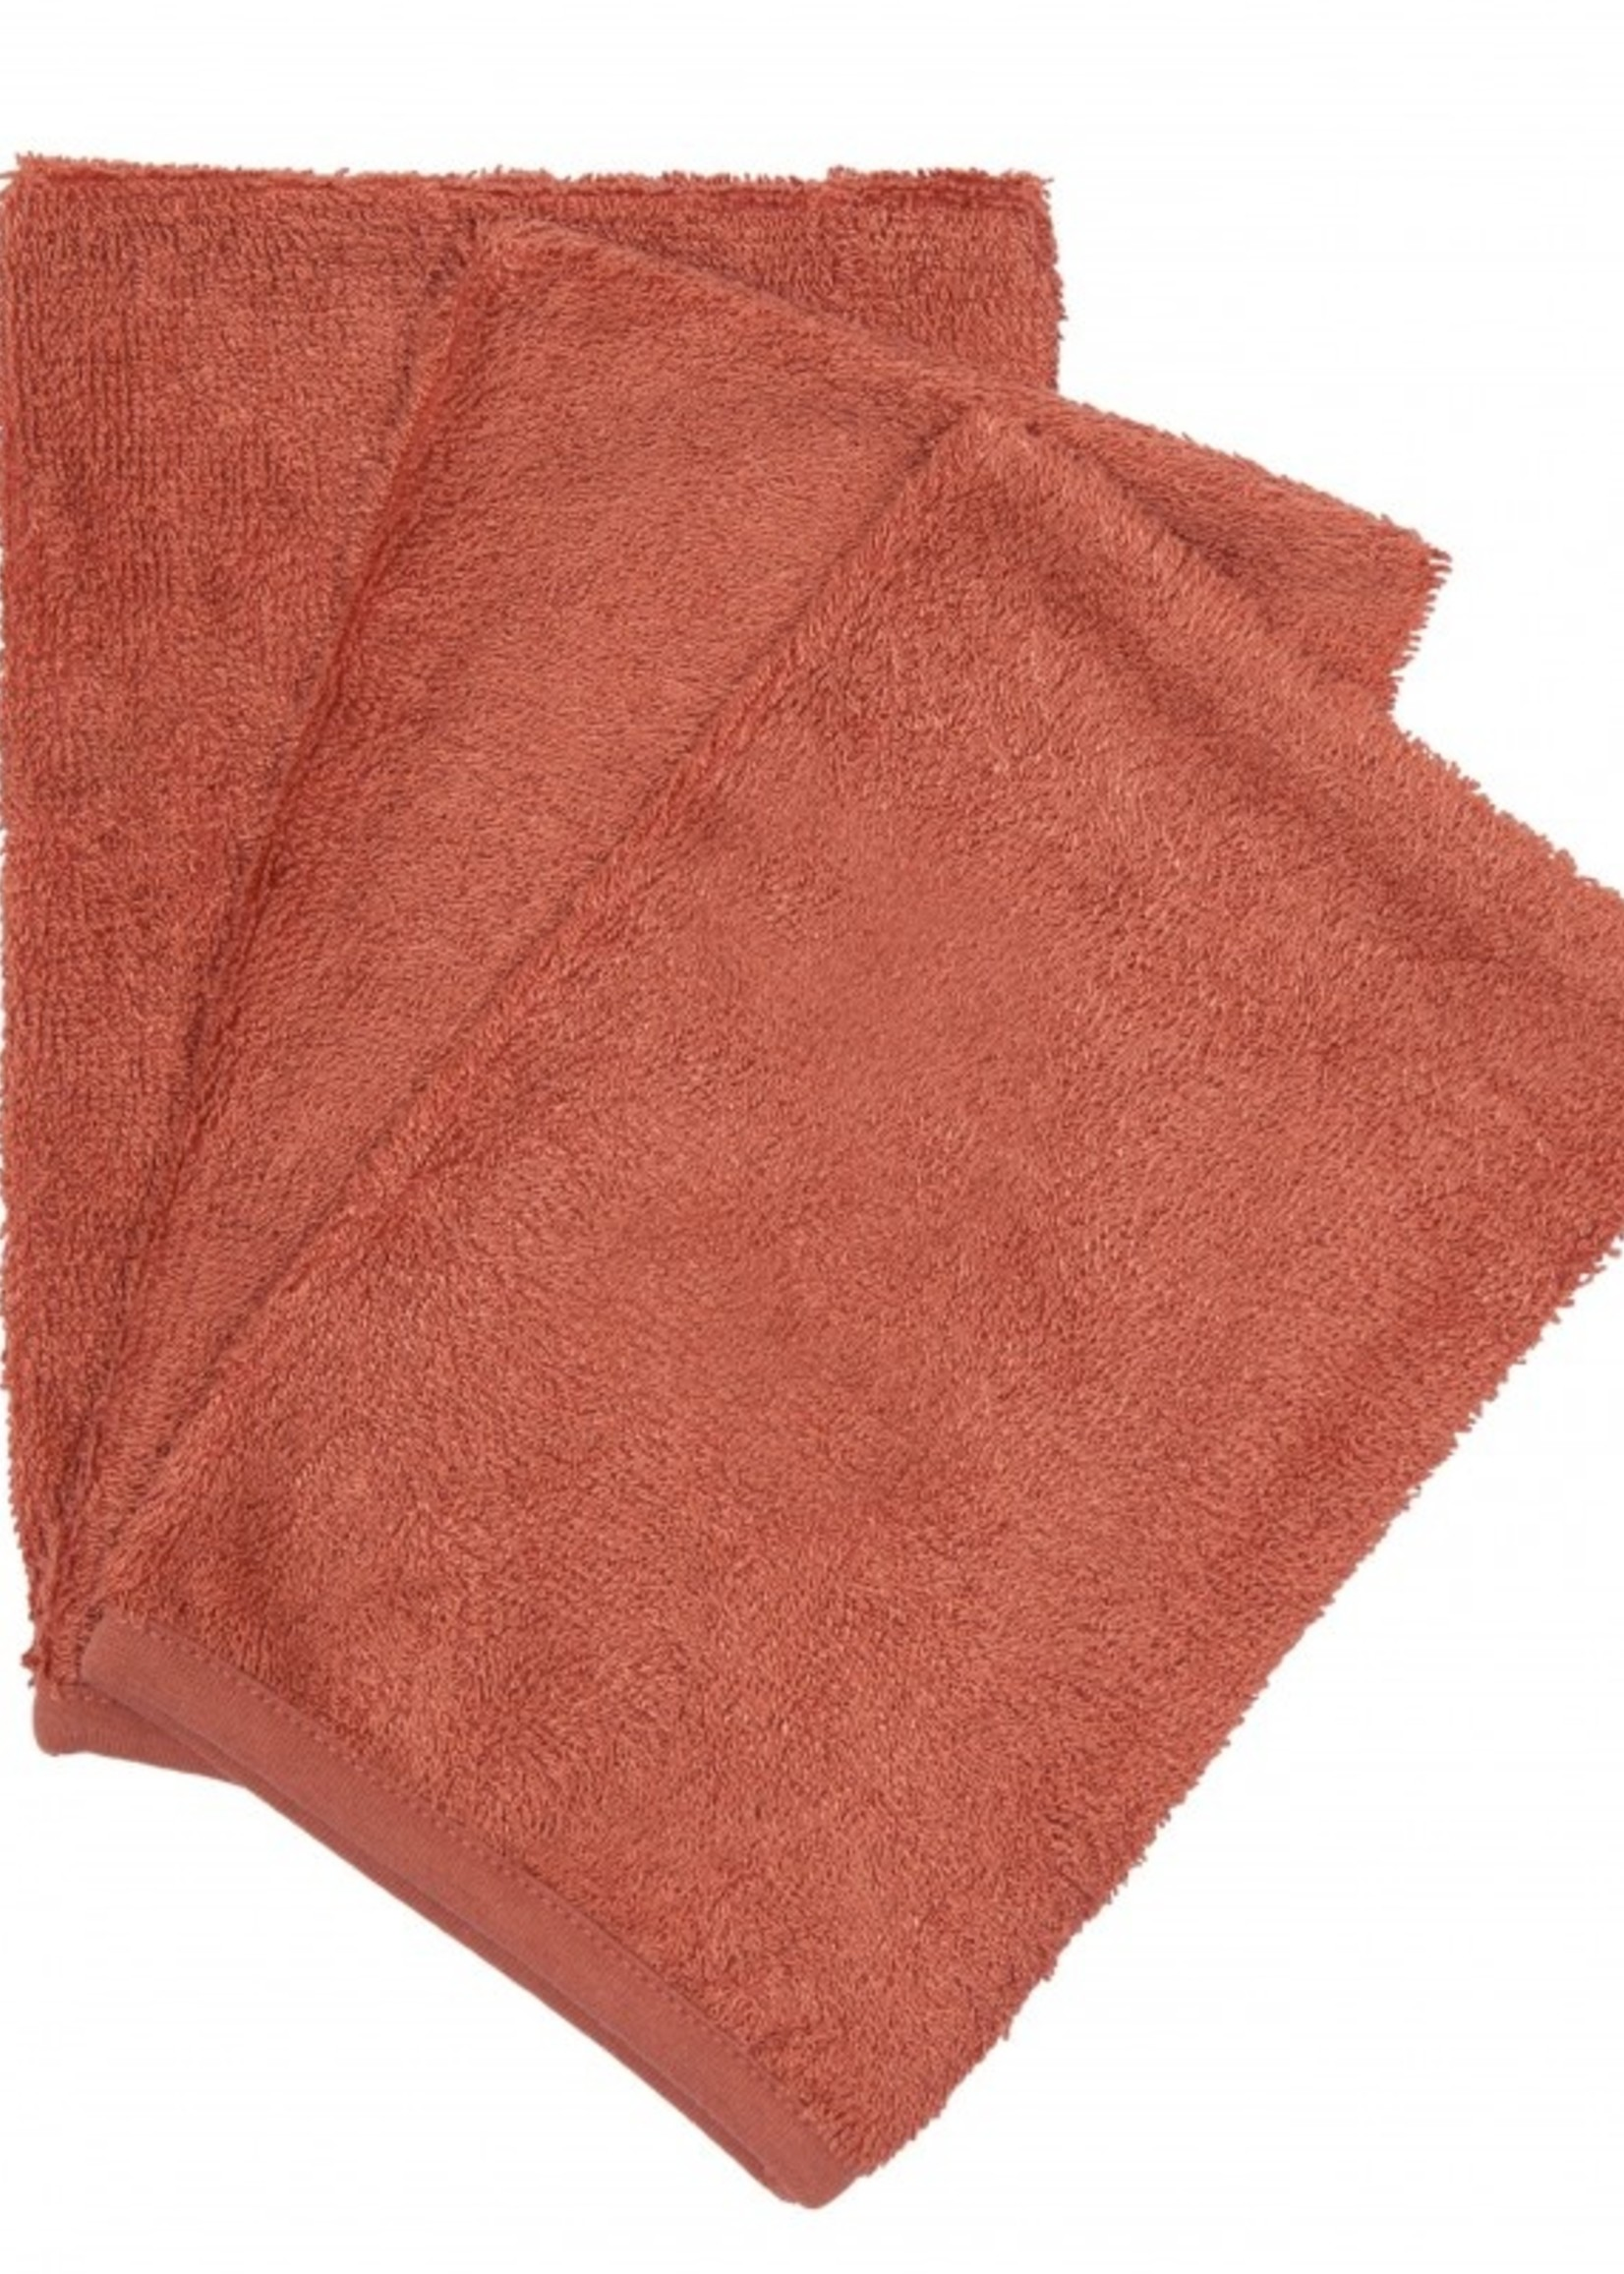 Timboo Set 3 Washcloths - Apricot Blush